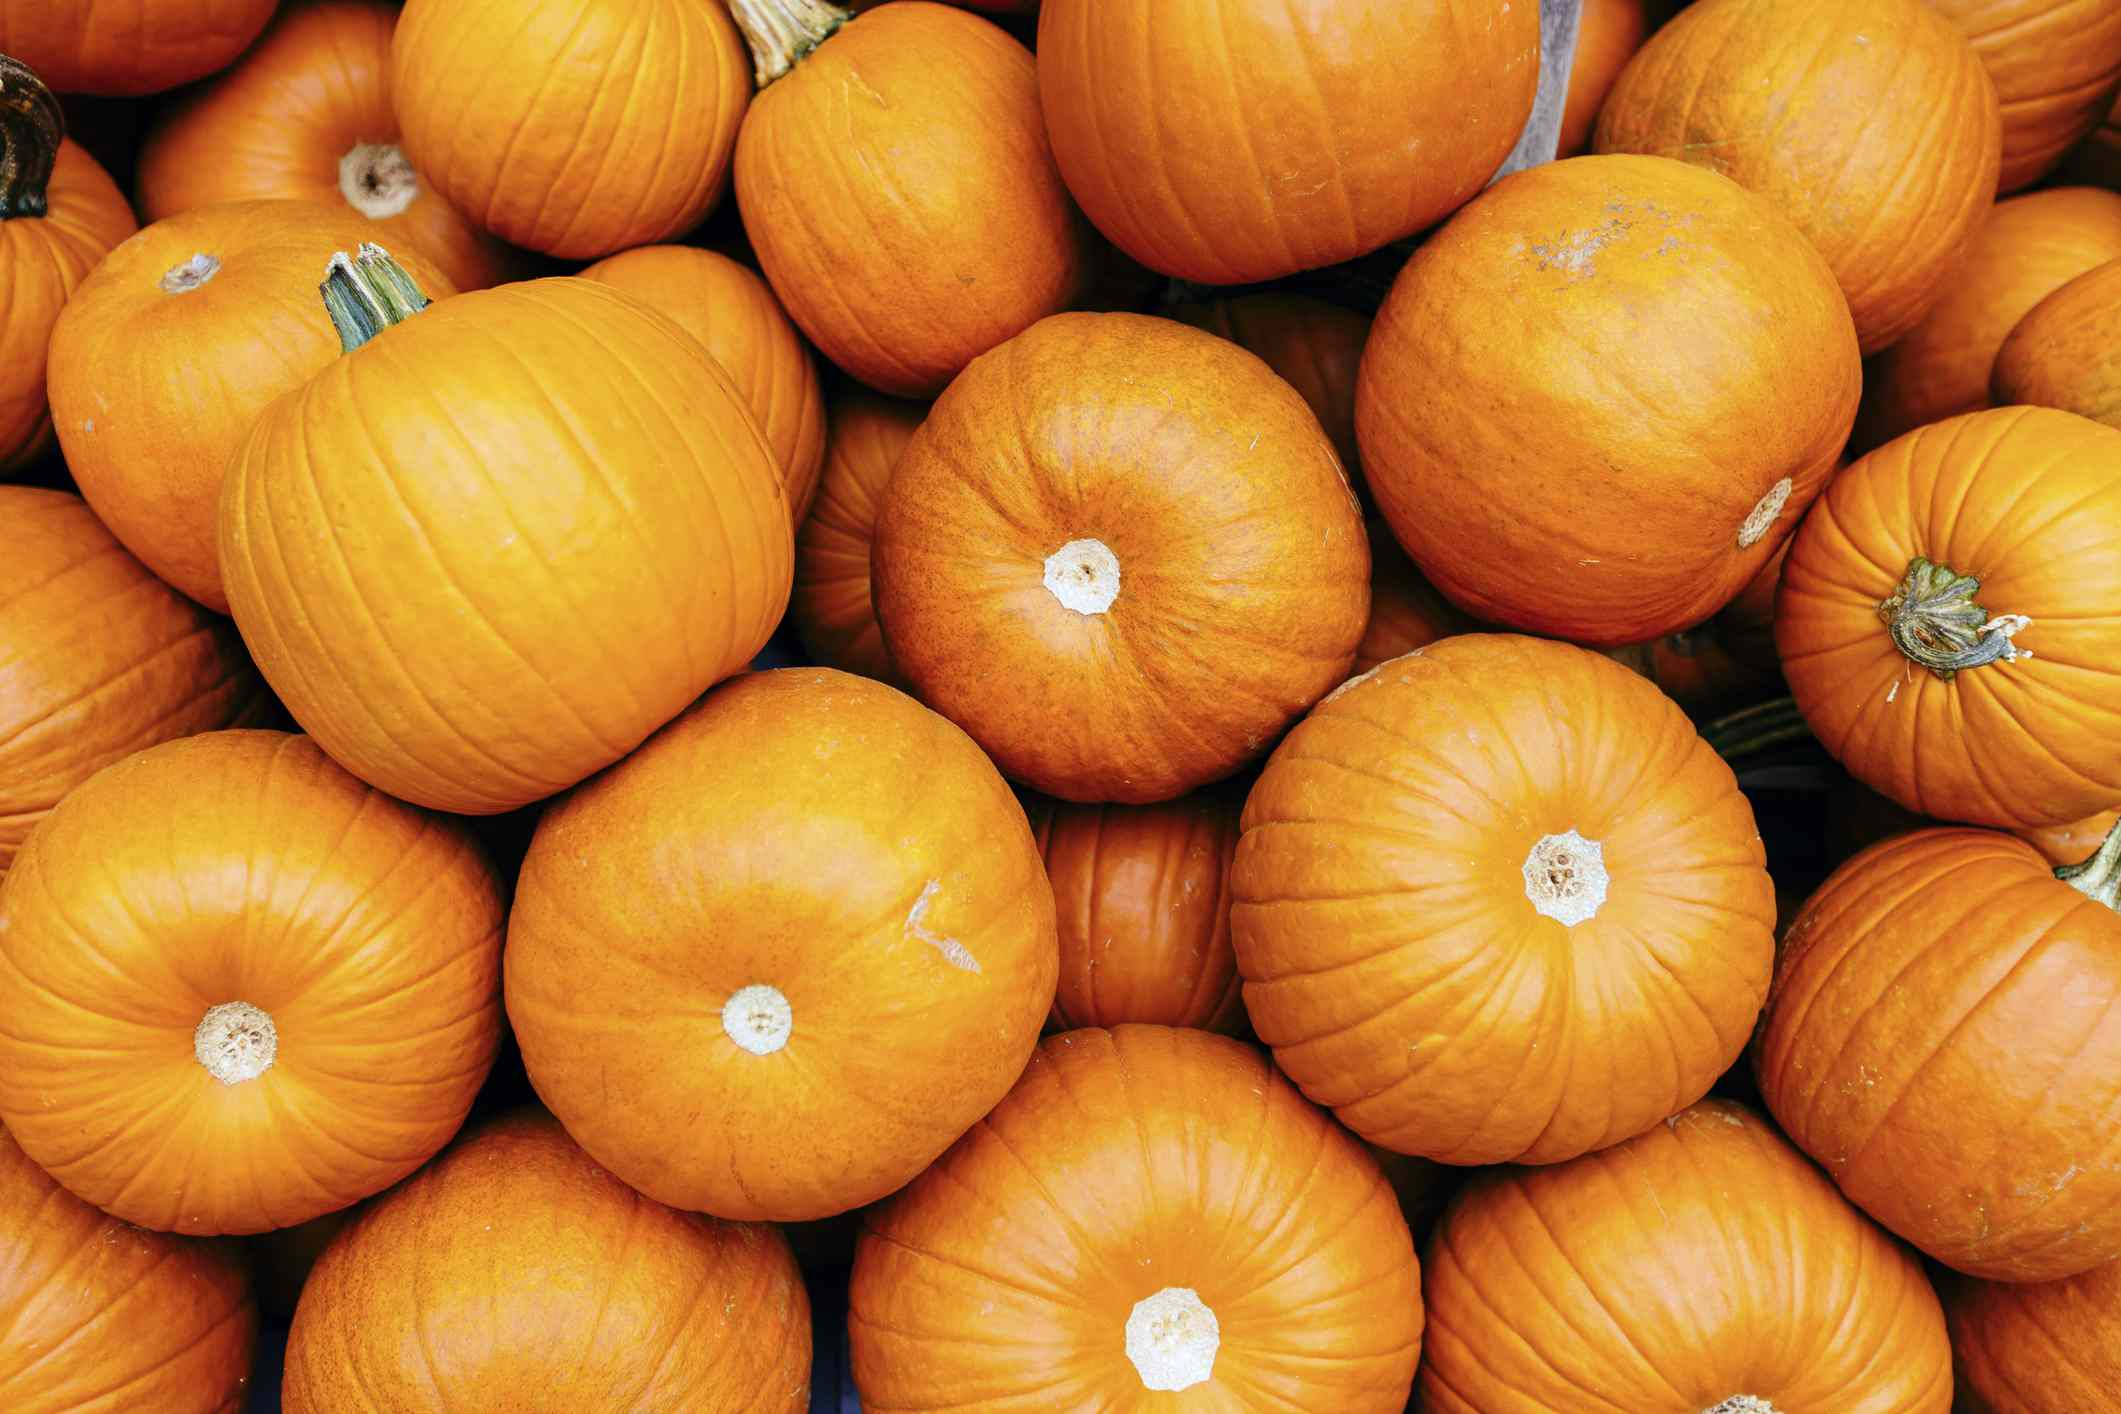 A full frame of pumpkins.